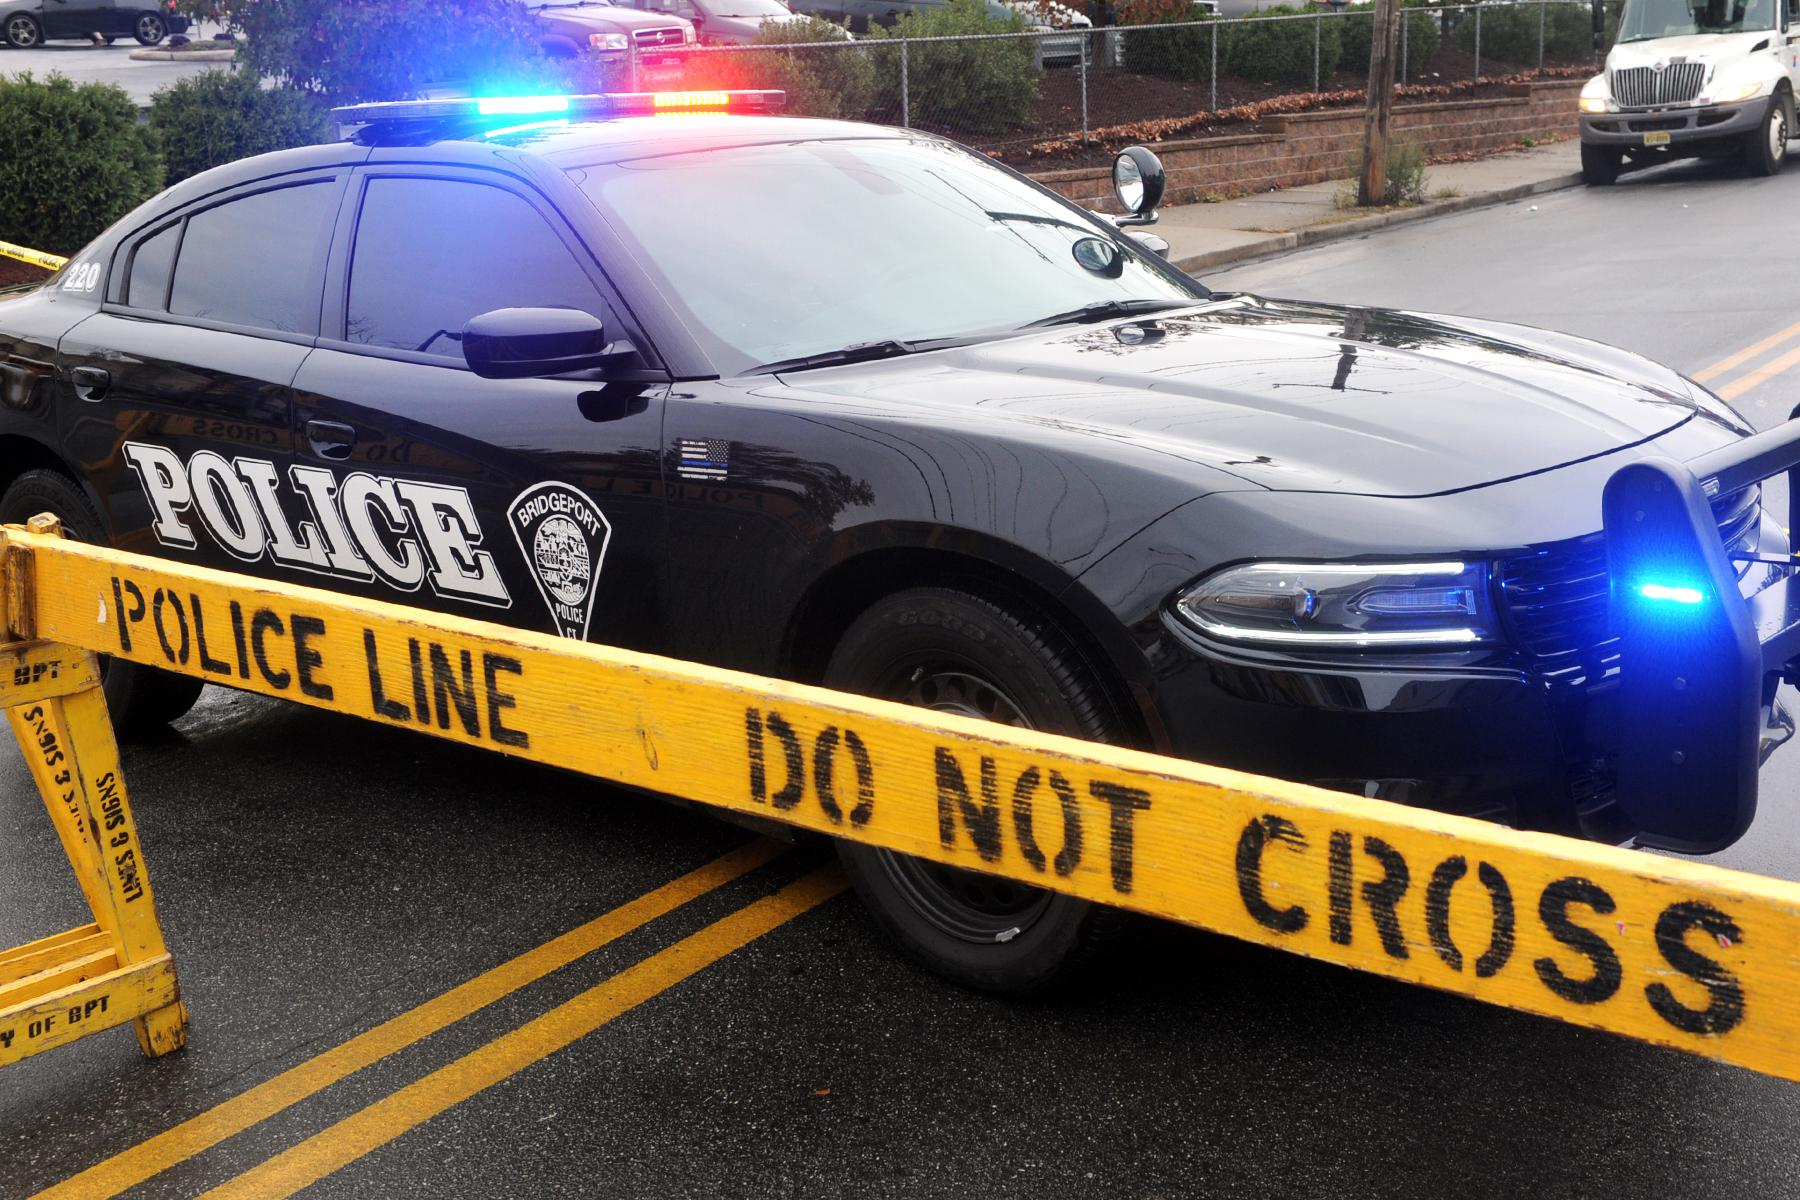 Police: 3 reportedly shot Friday night in Bridgeport